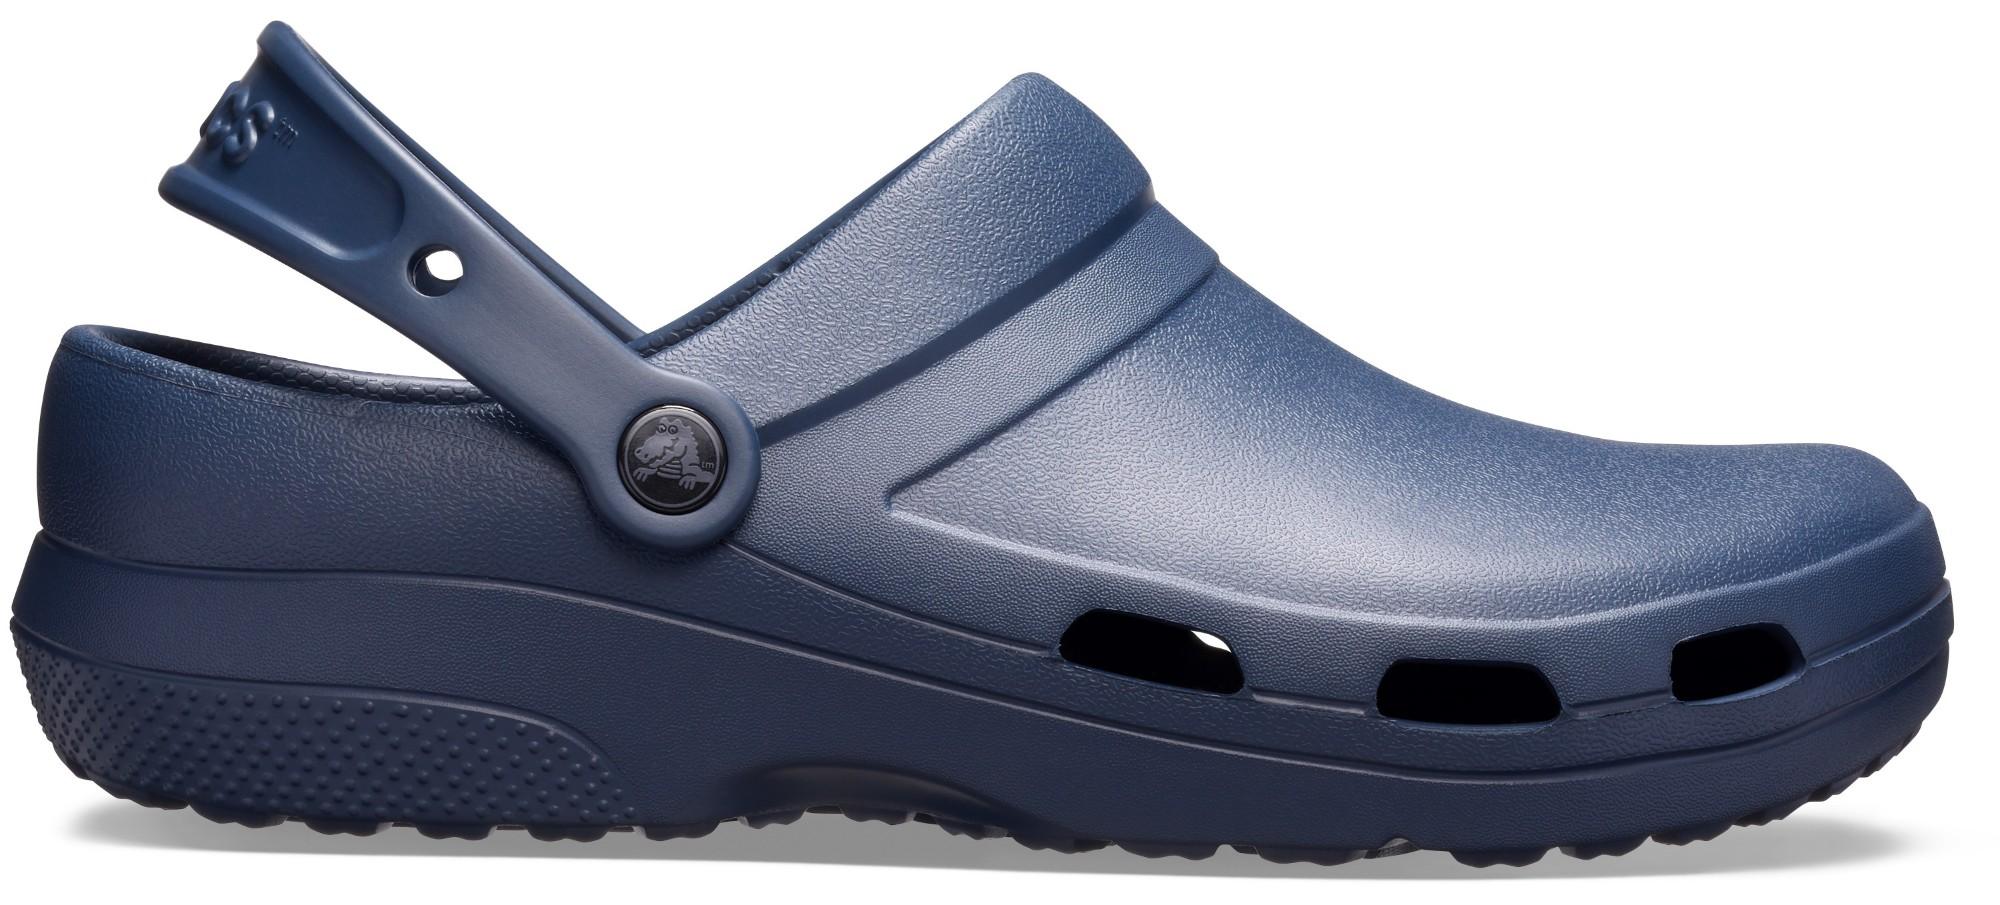 Crocs™ Specialist II Vent Clog Navy 43,5